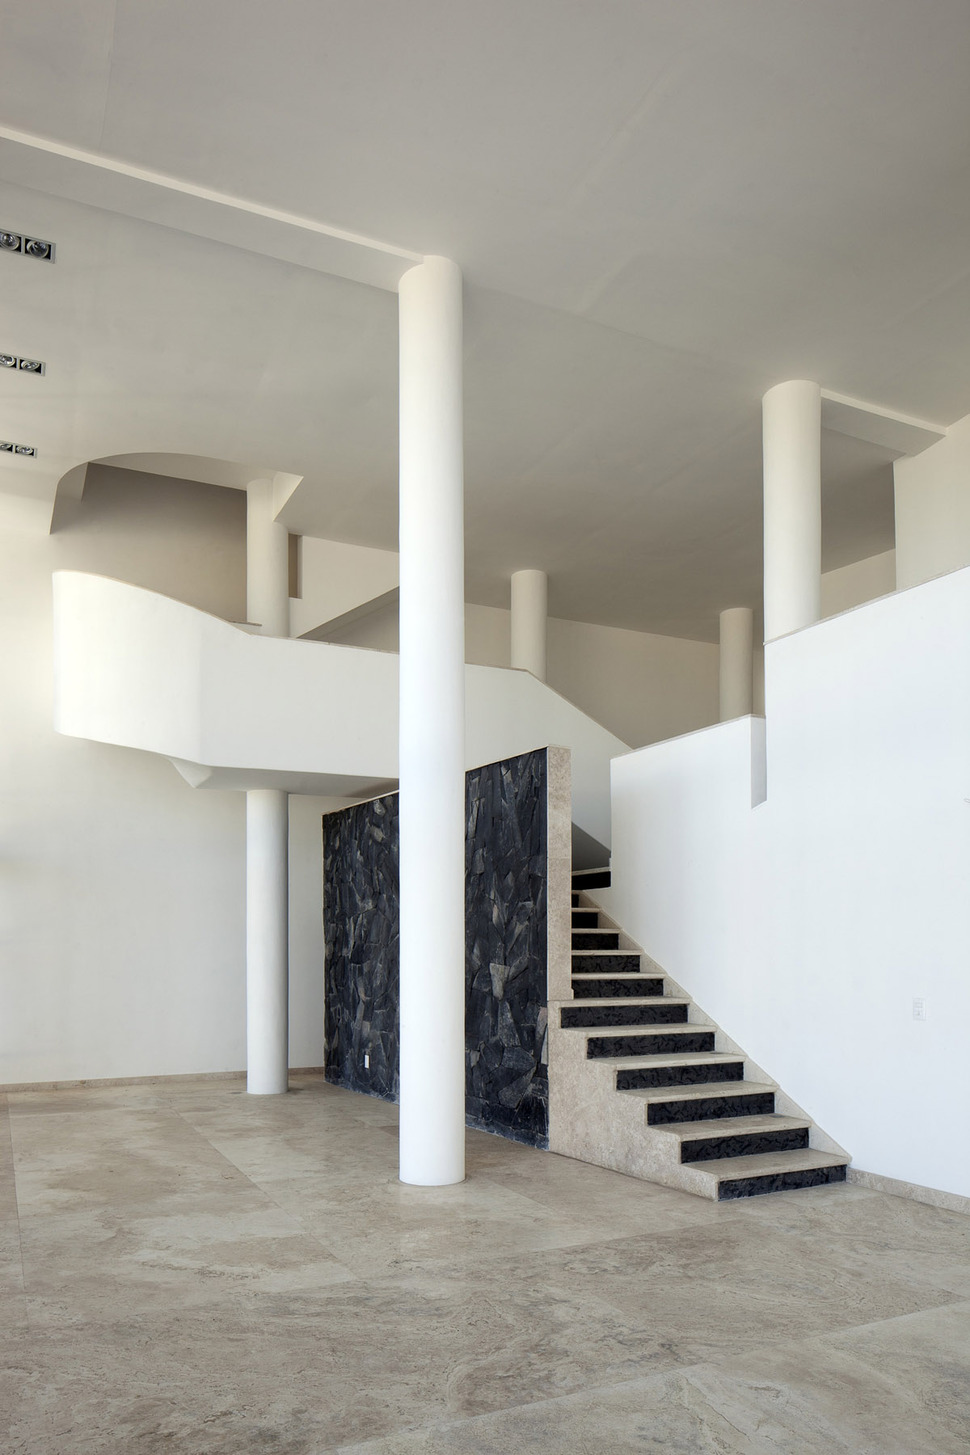 Support Pillars Houses